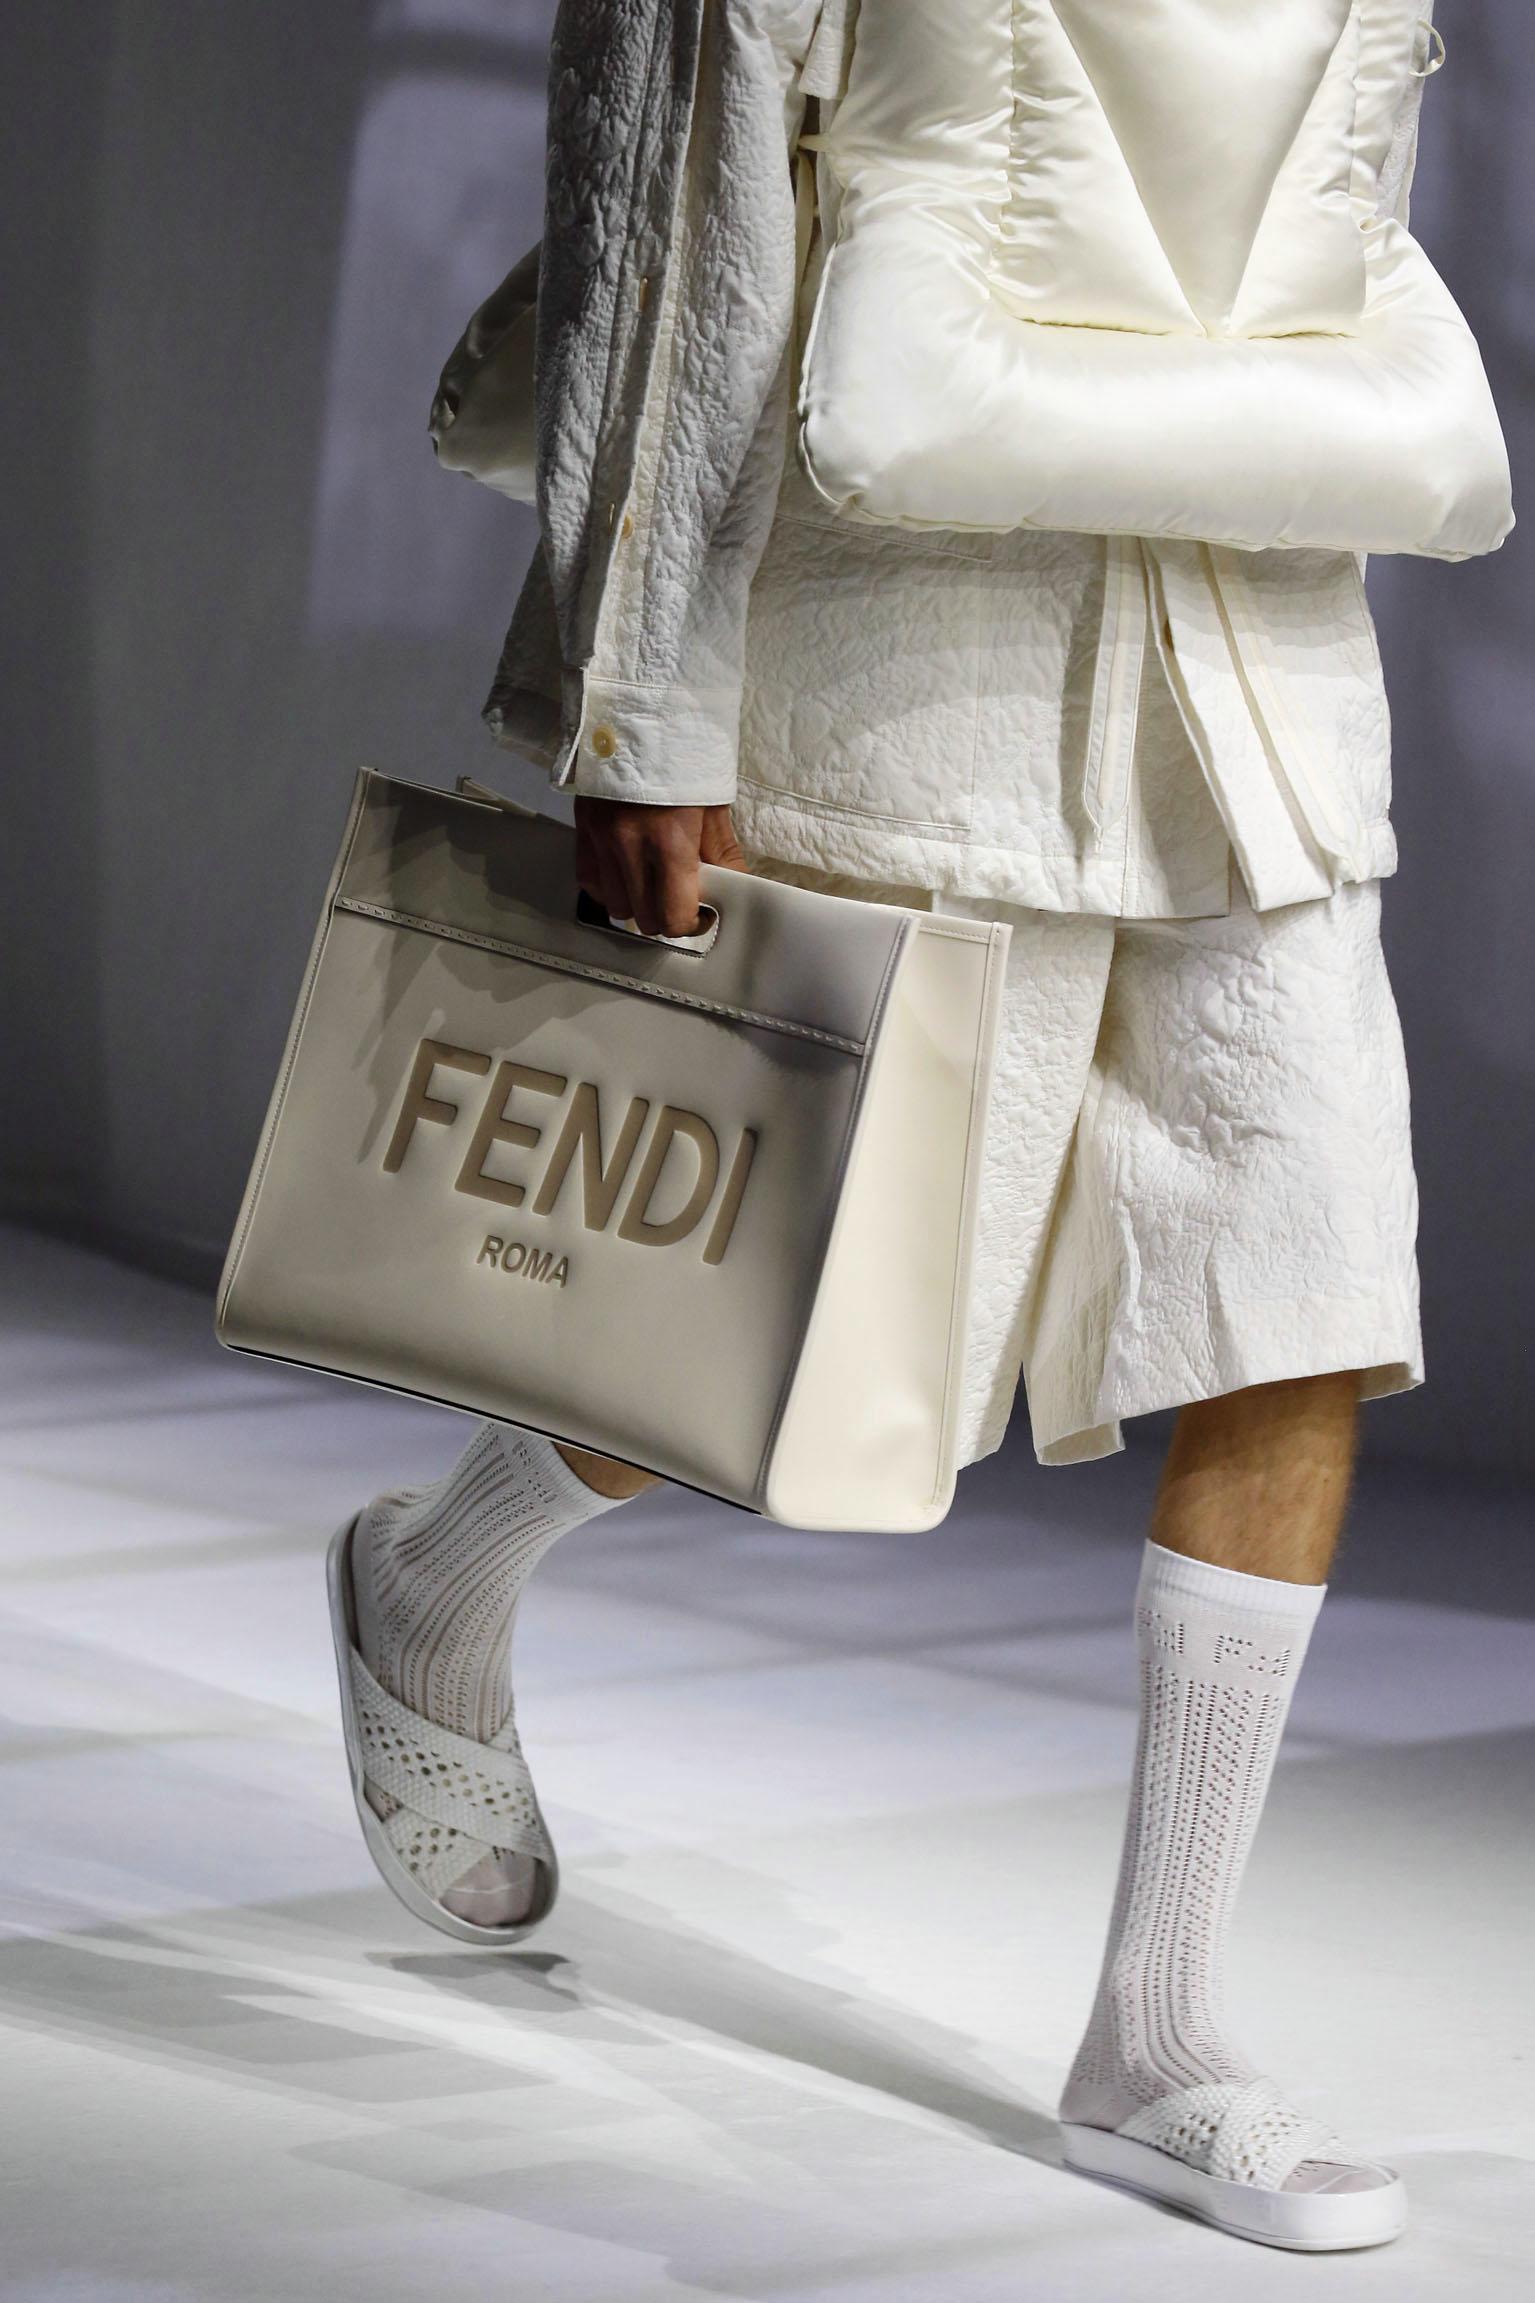 Details from Fendi Spring/Summer 2021 Show